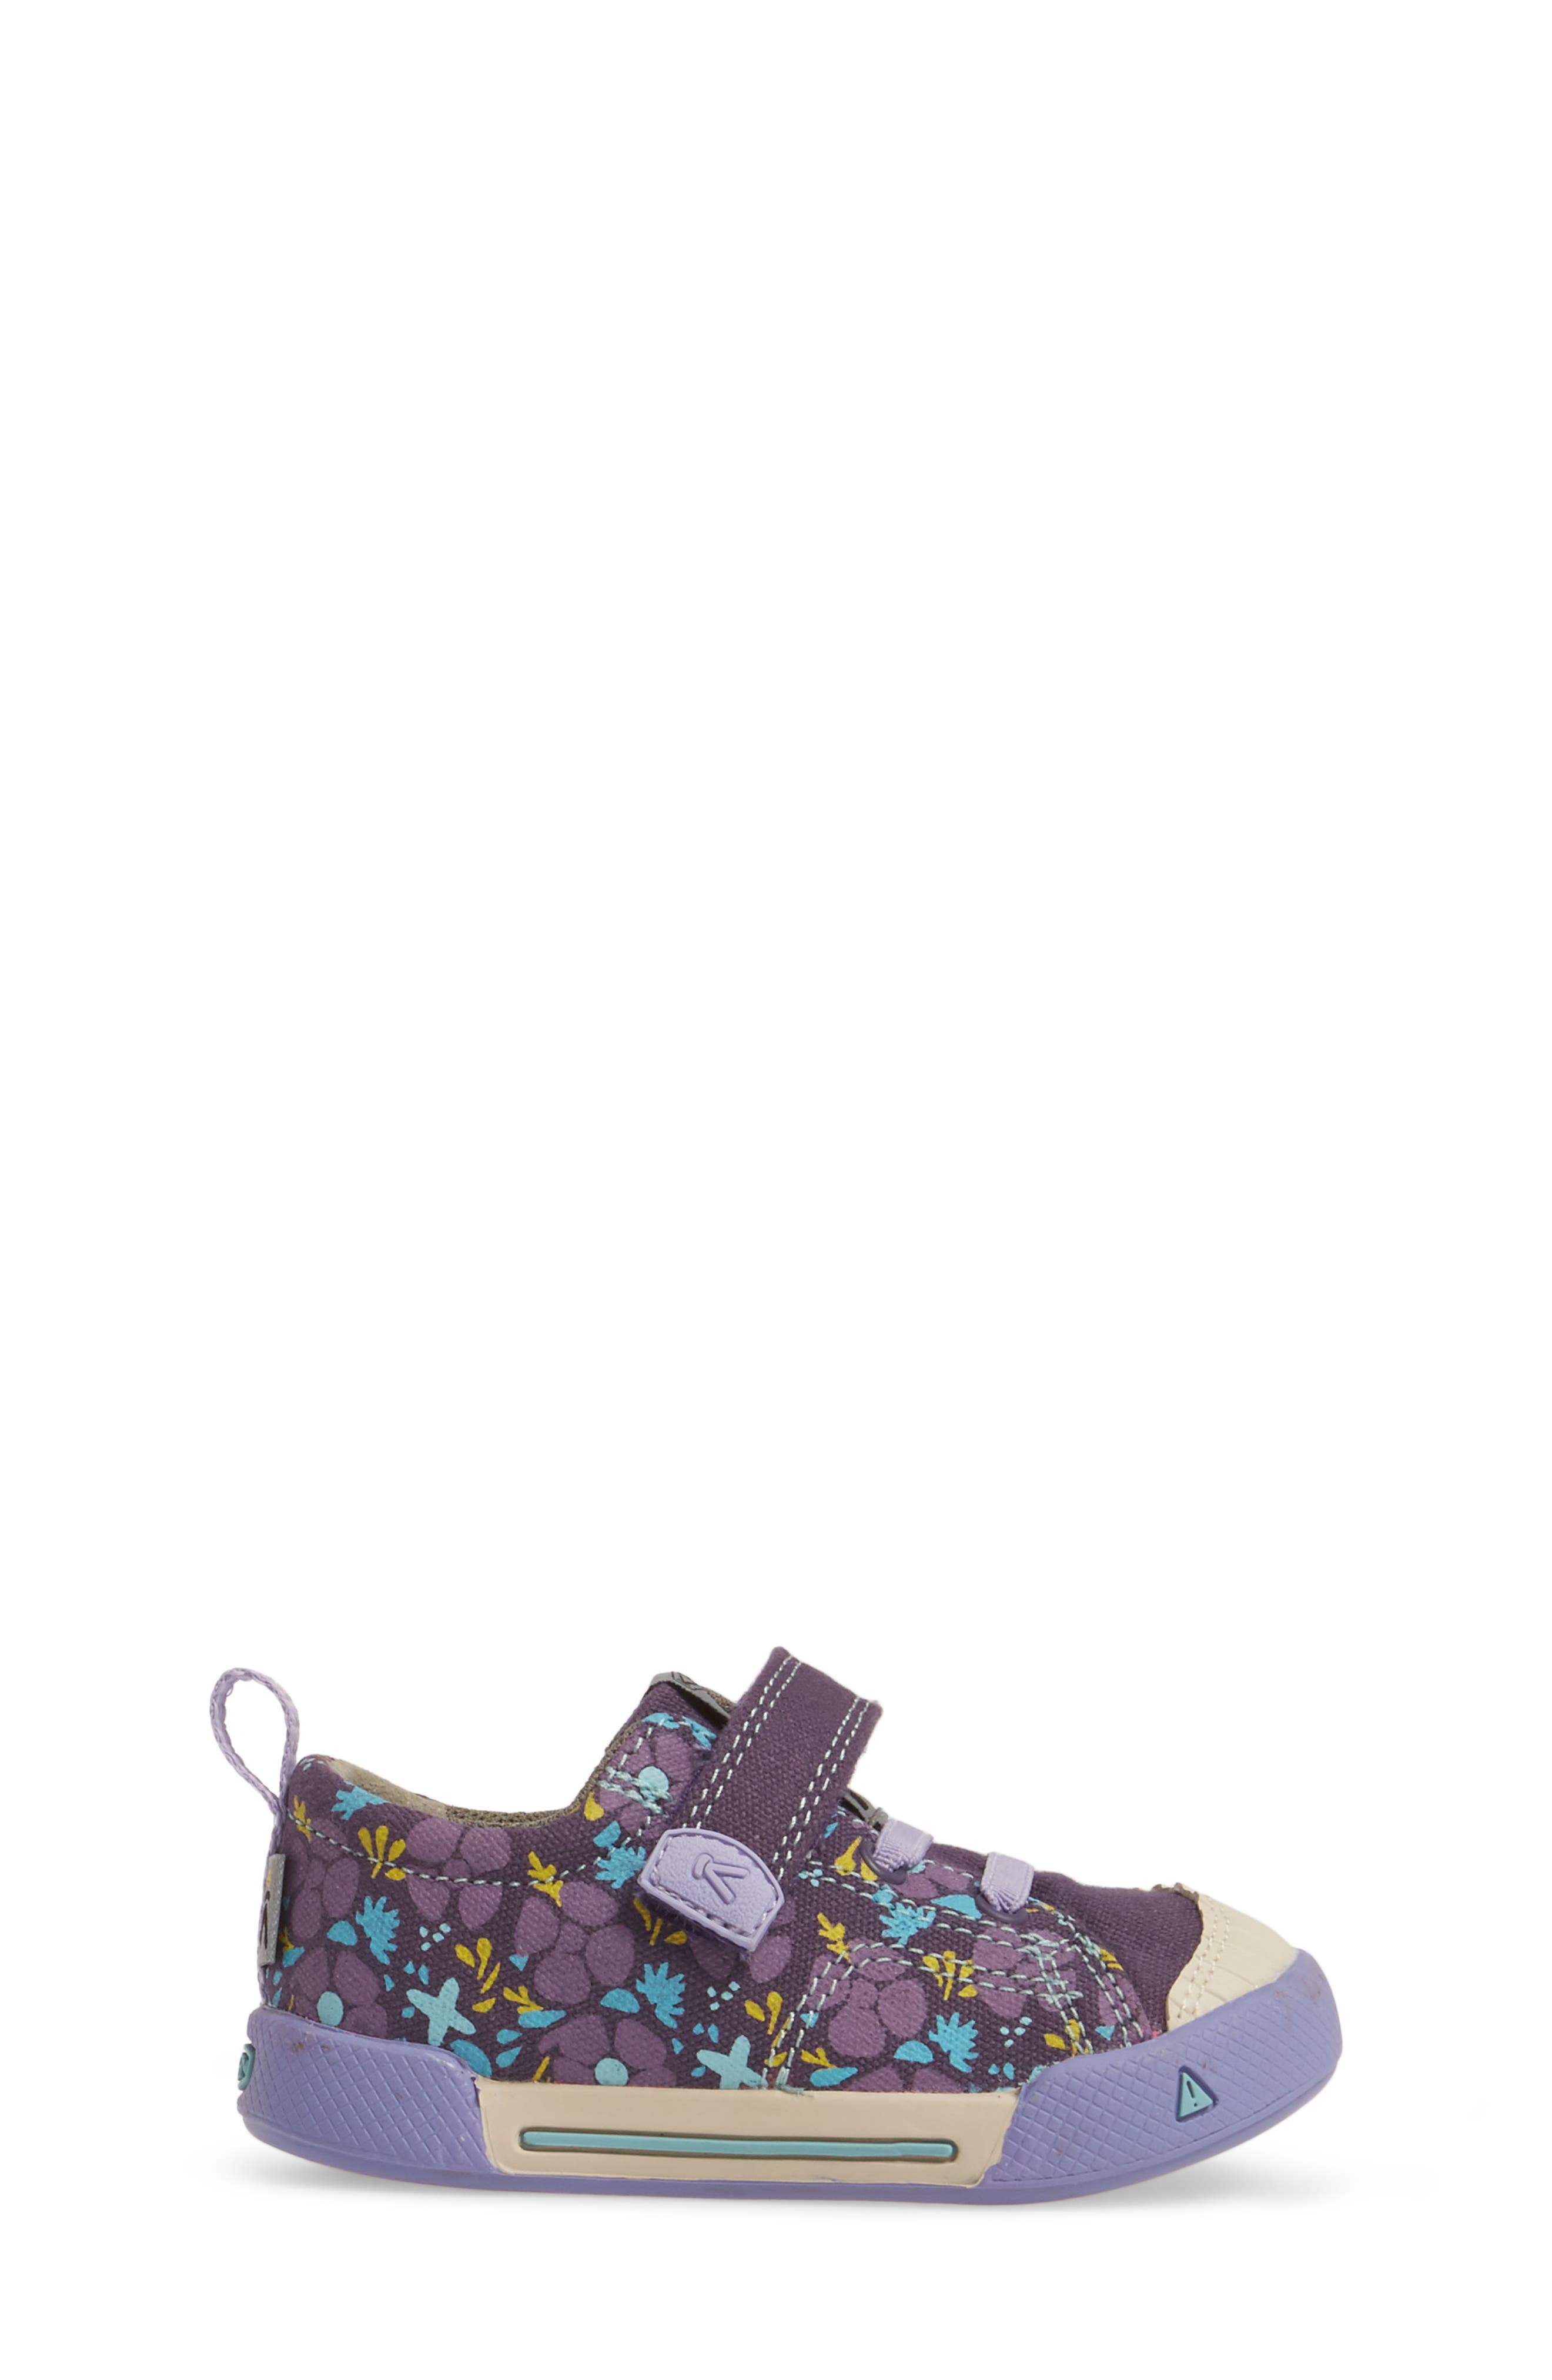 Alternate Image 3  - Keen Encanto Finley Sneaker (Baby, Walker, Toddler, Little Kid & Big Kid)